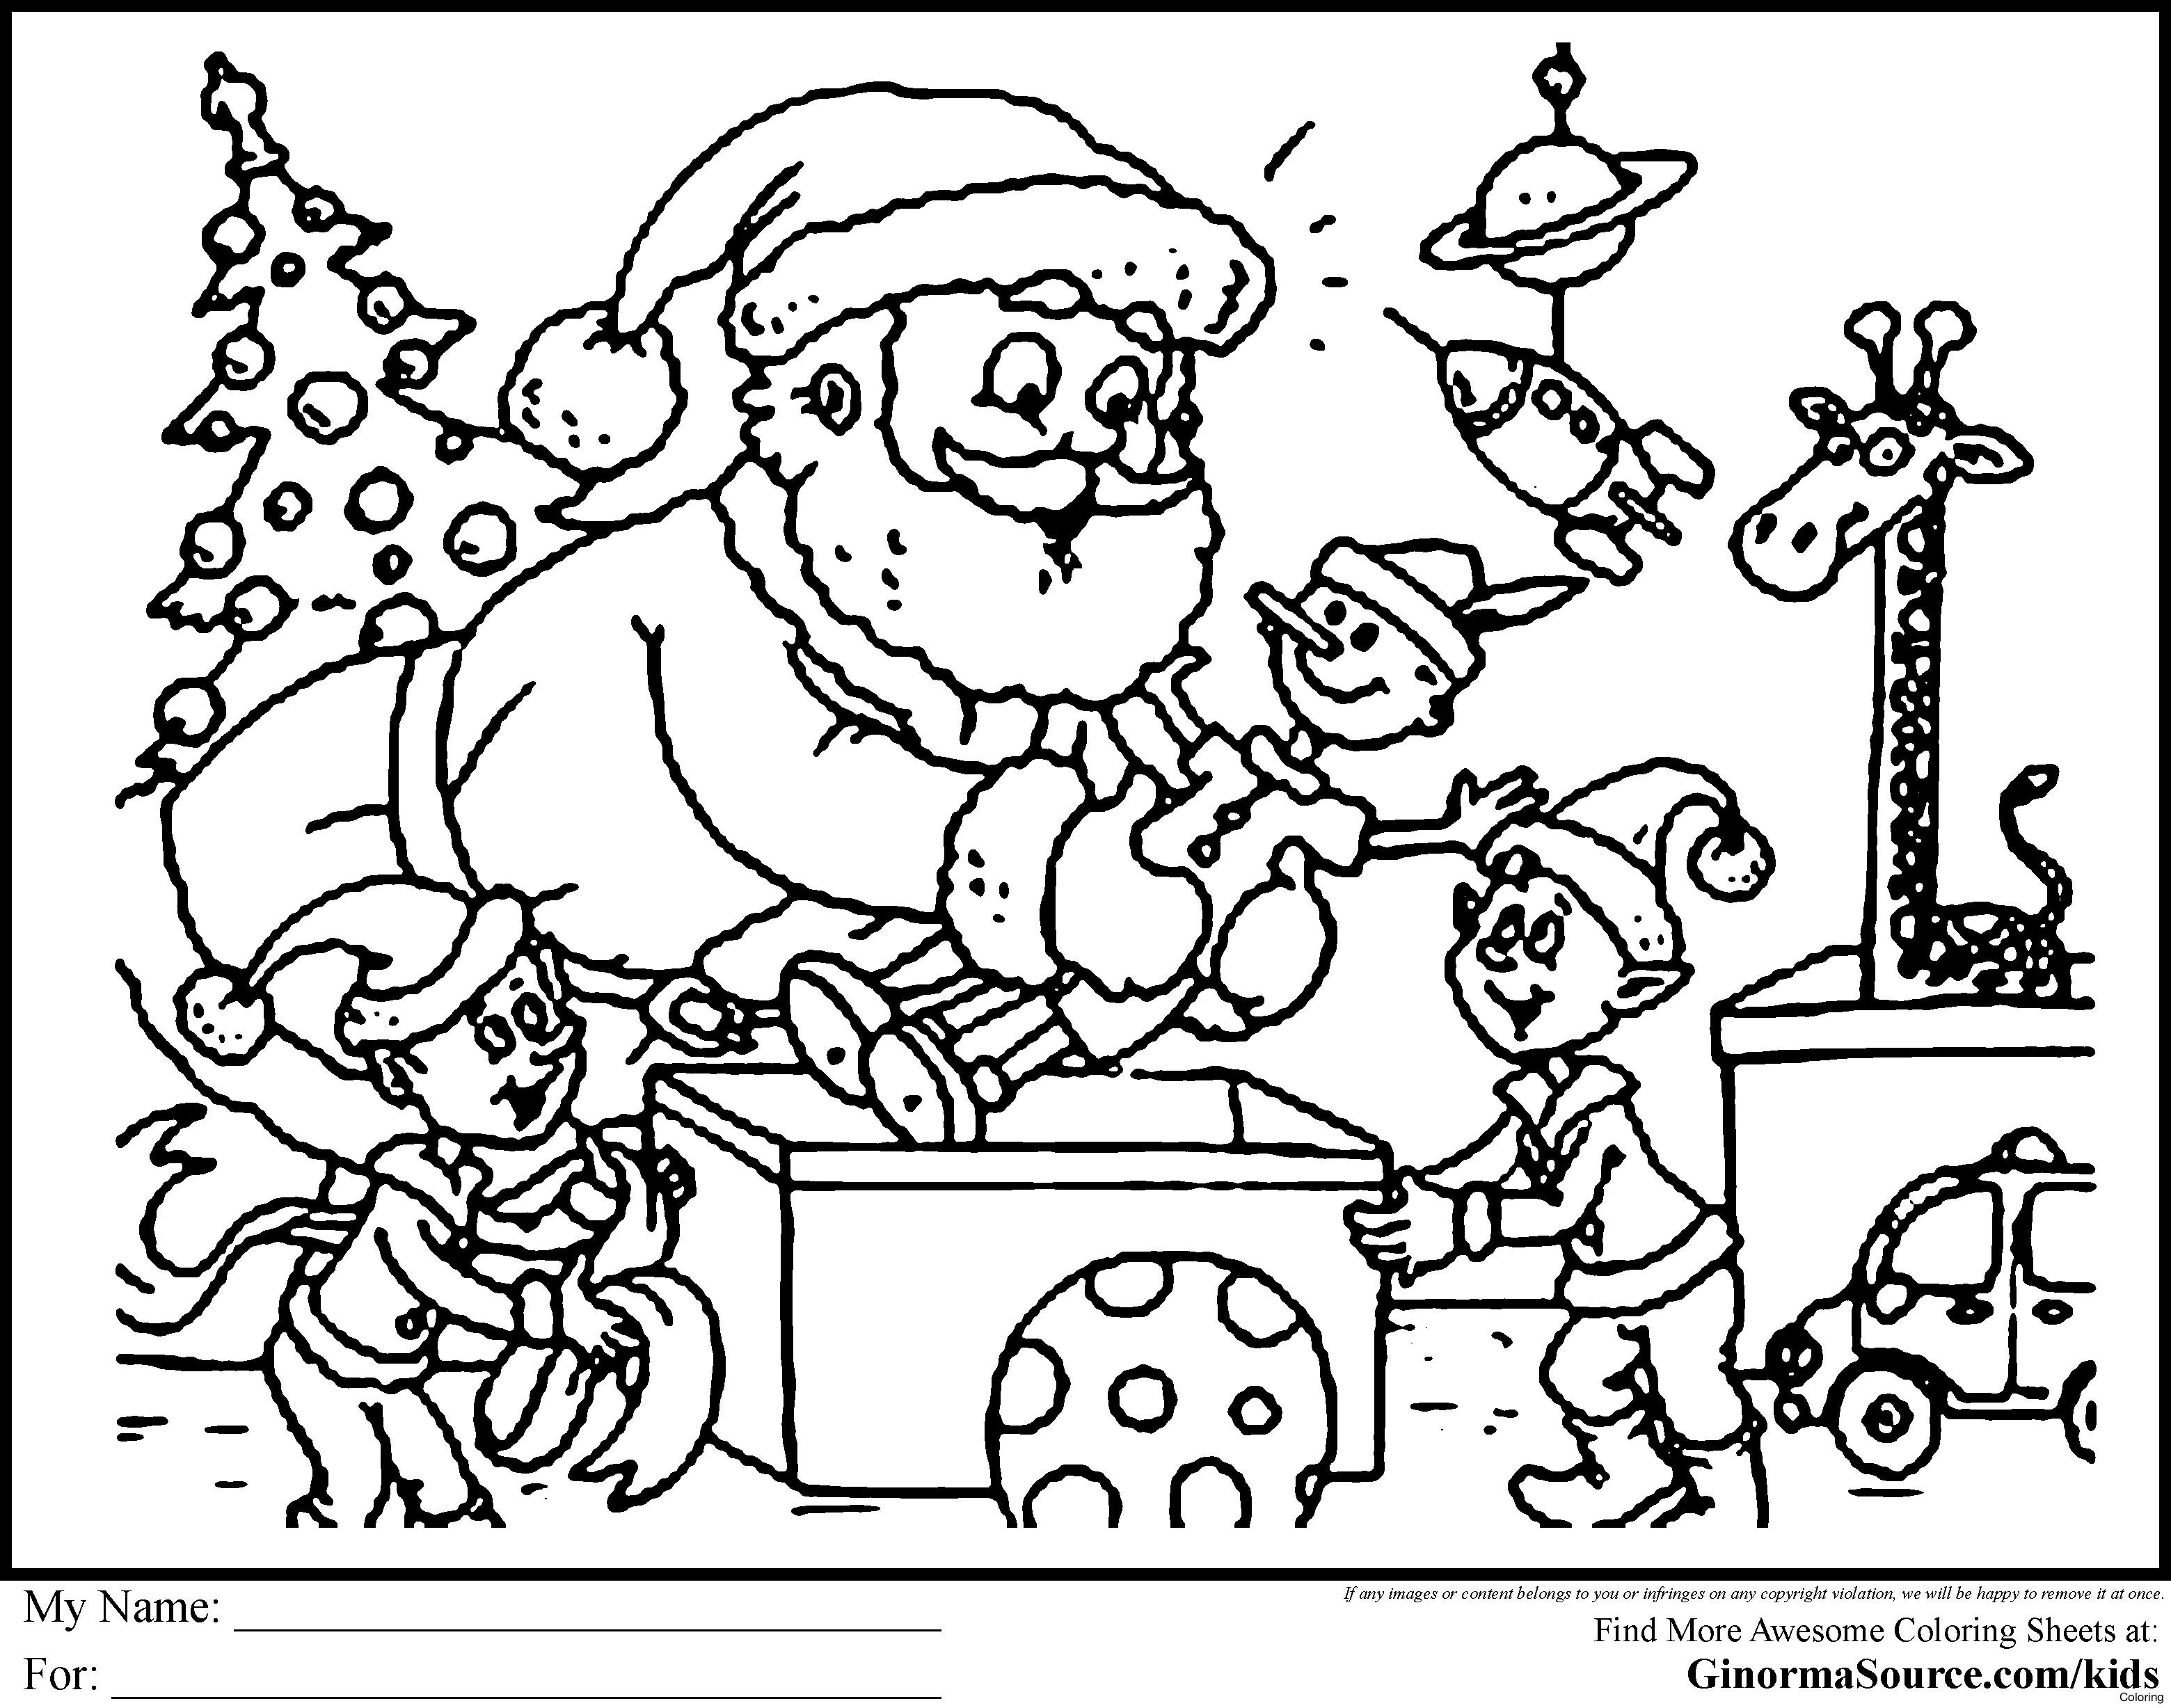 Crayola Crayons Drawing at GetDrawings.com | Free for personal use ...